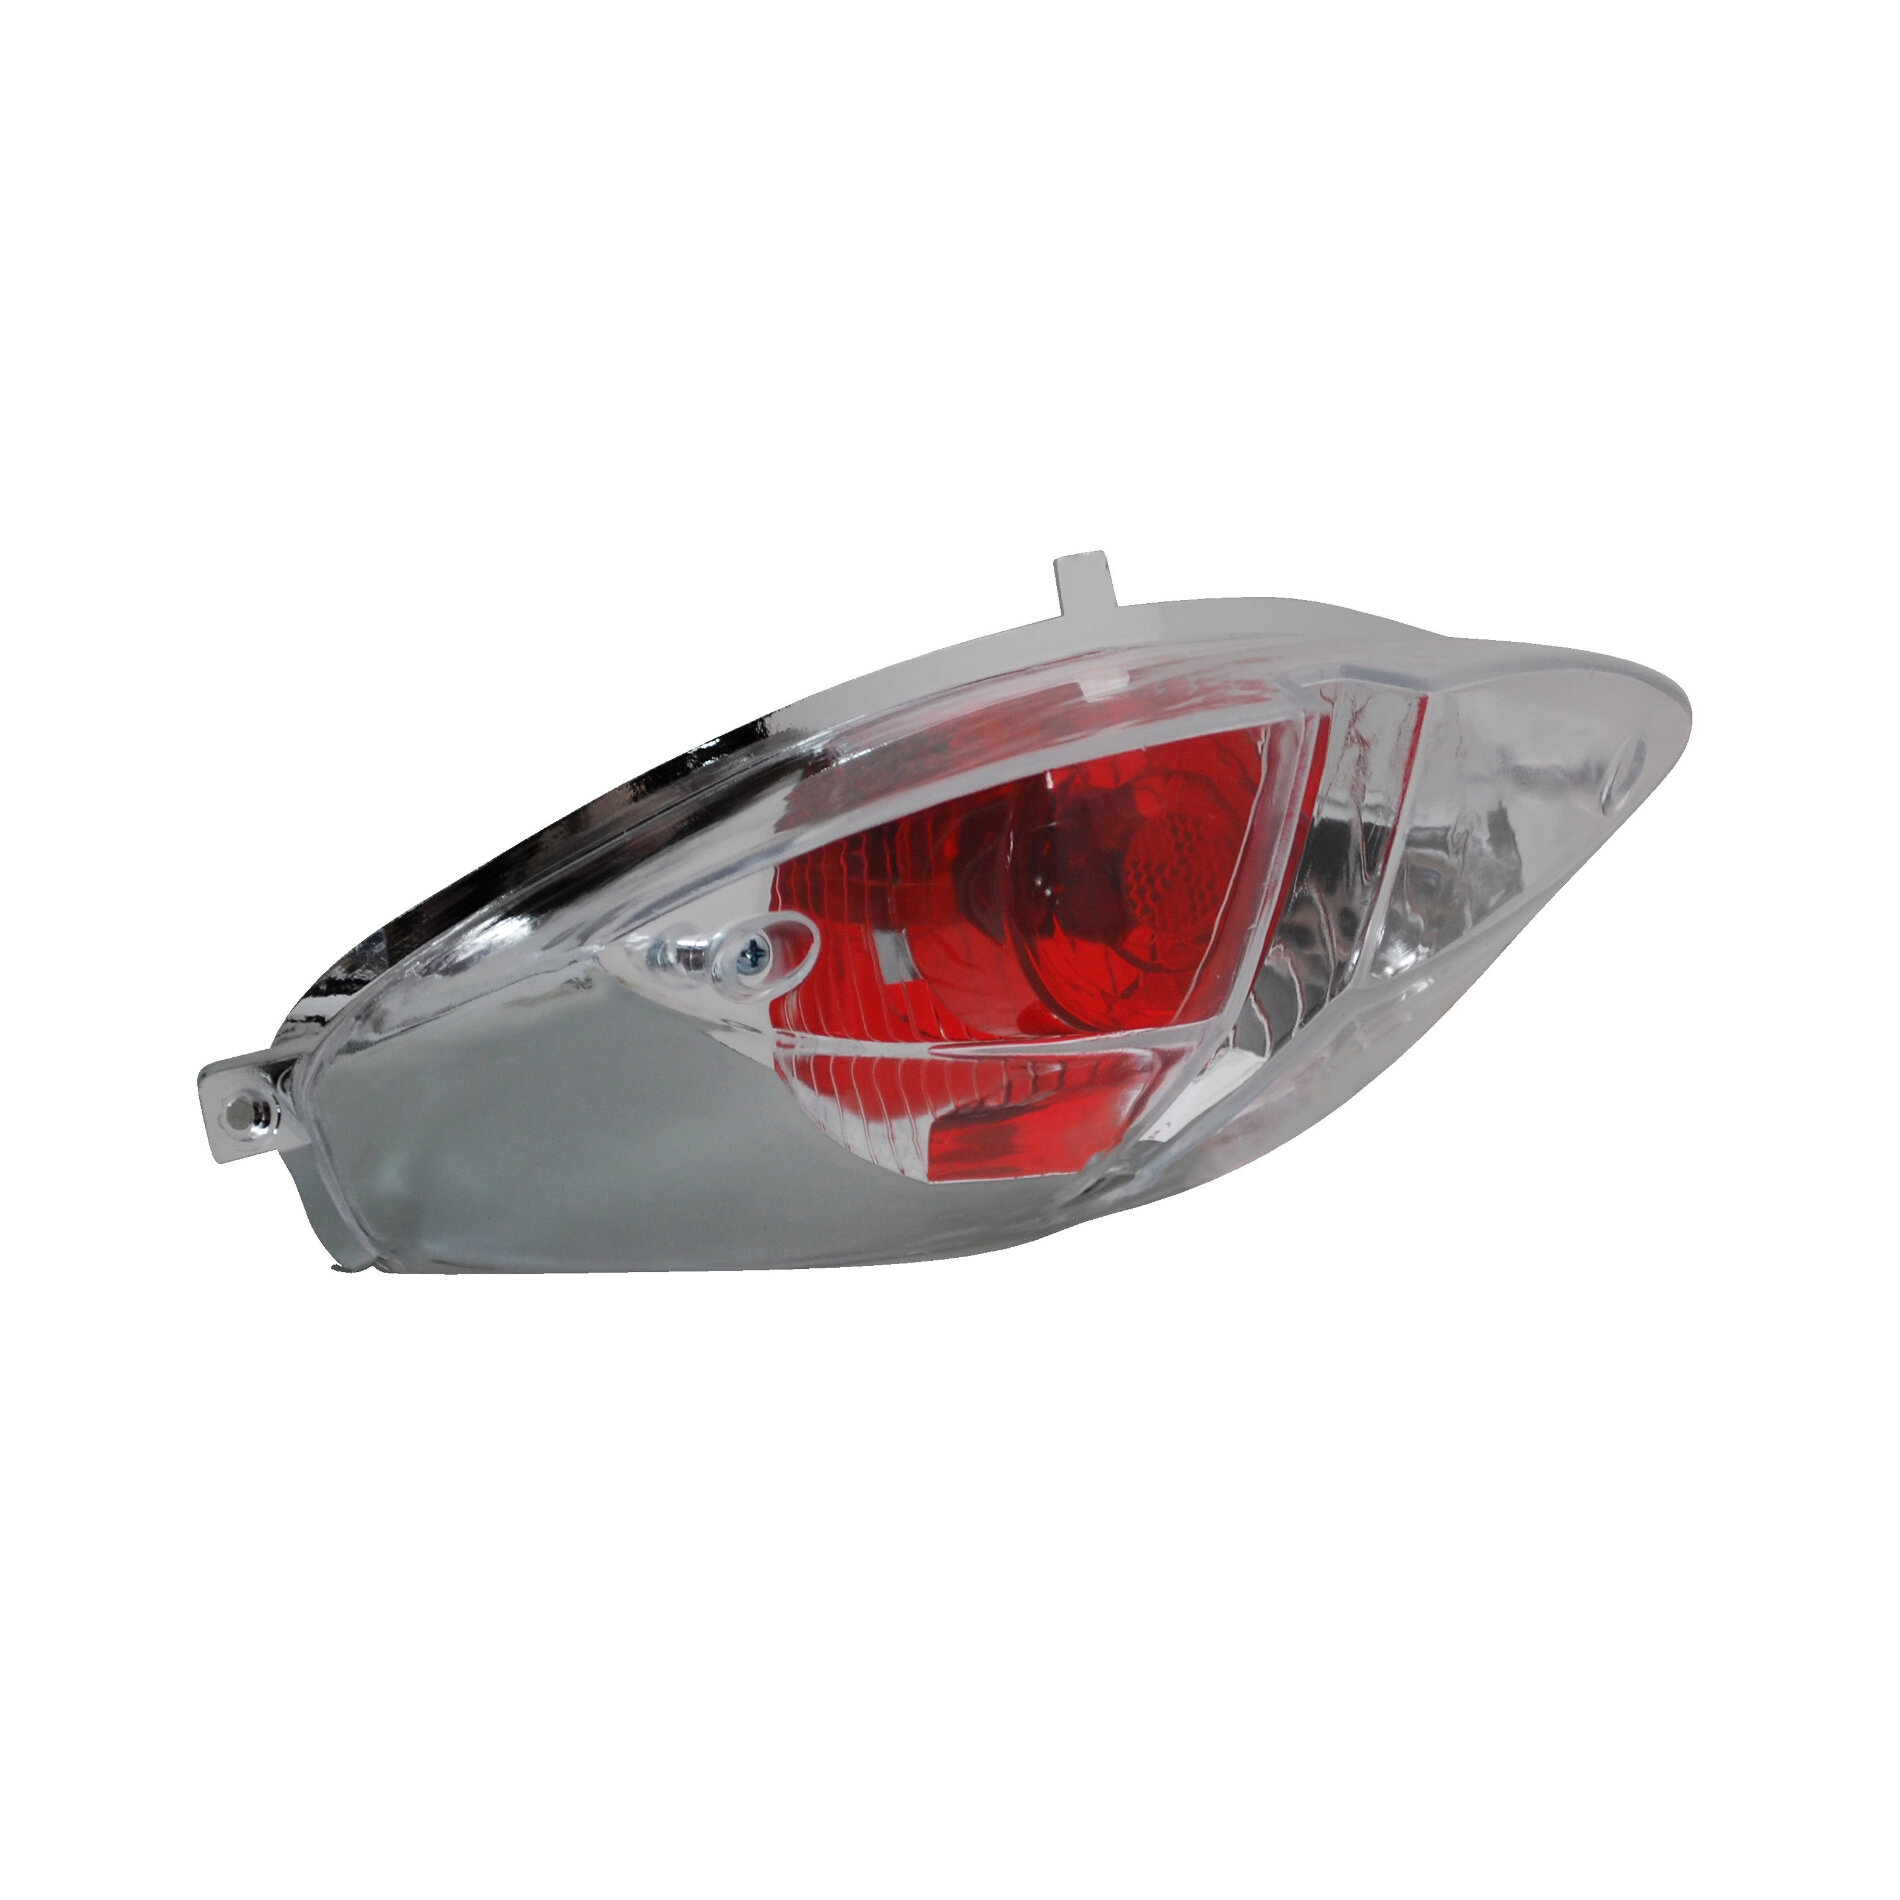 Feu arrière complet type Lexus Speedfight 2 - Lexus